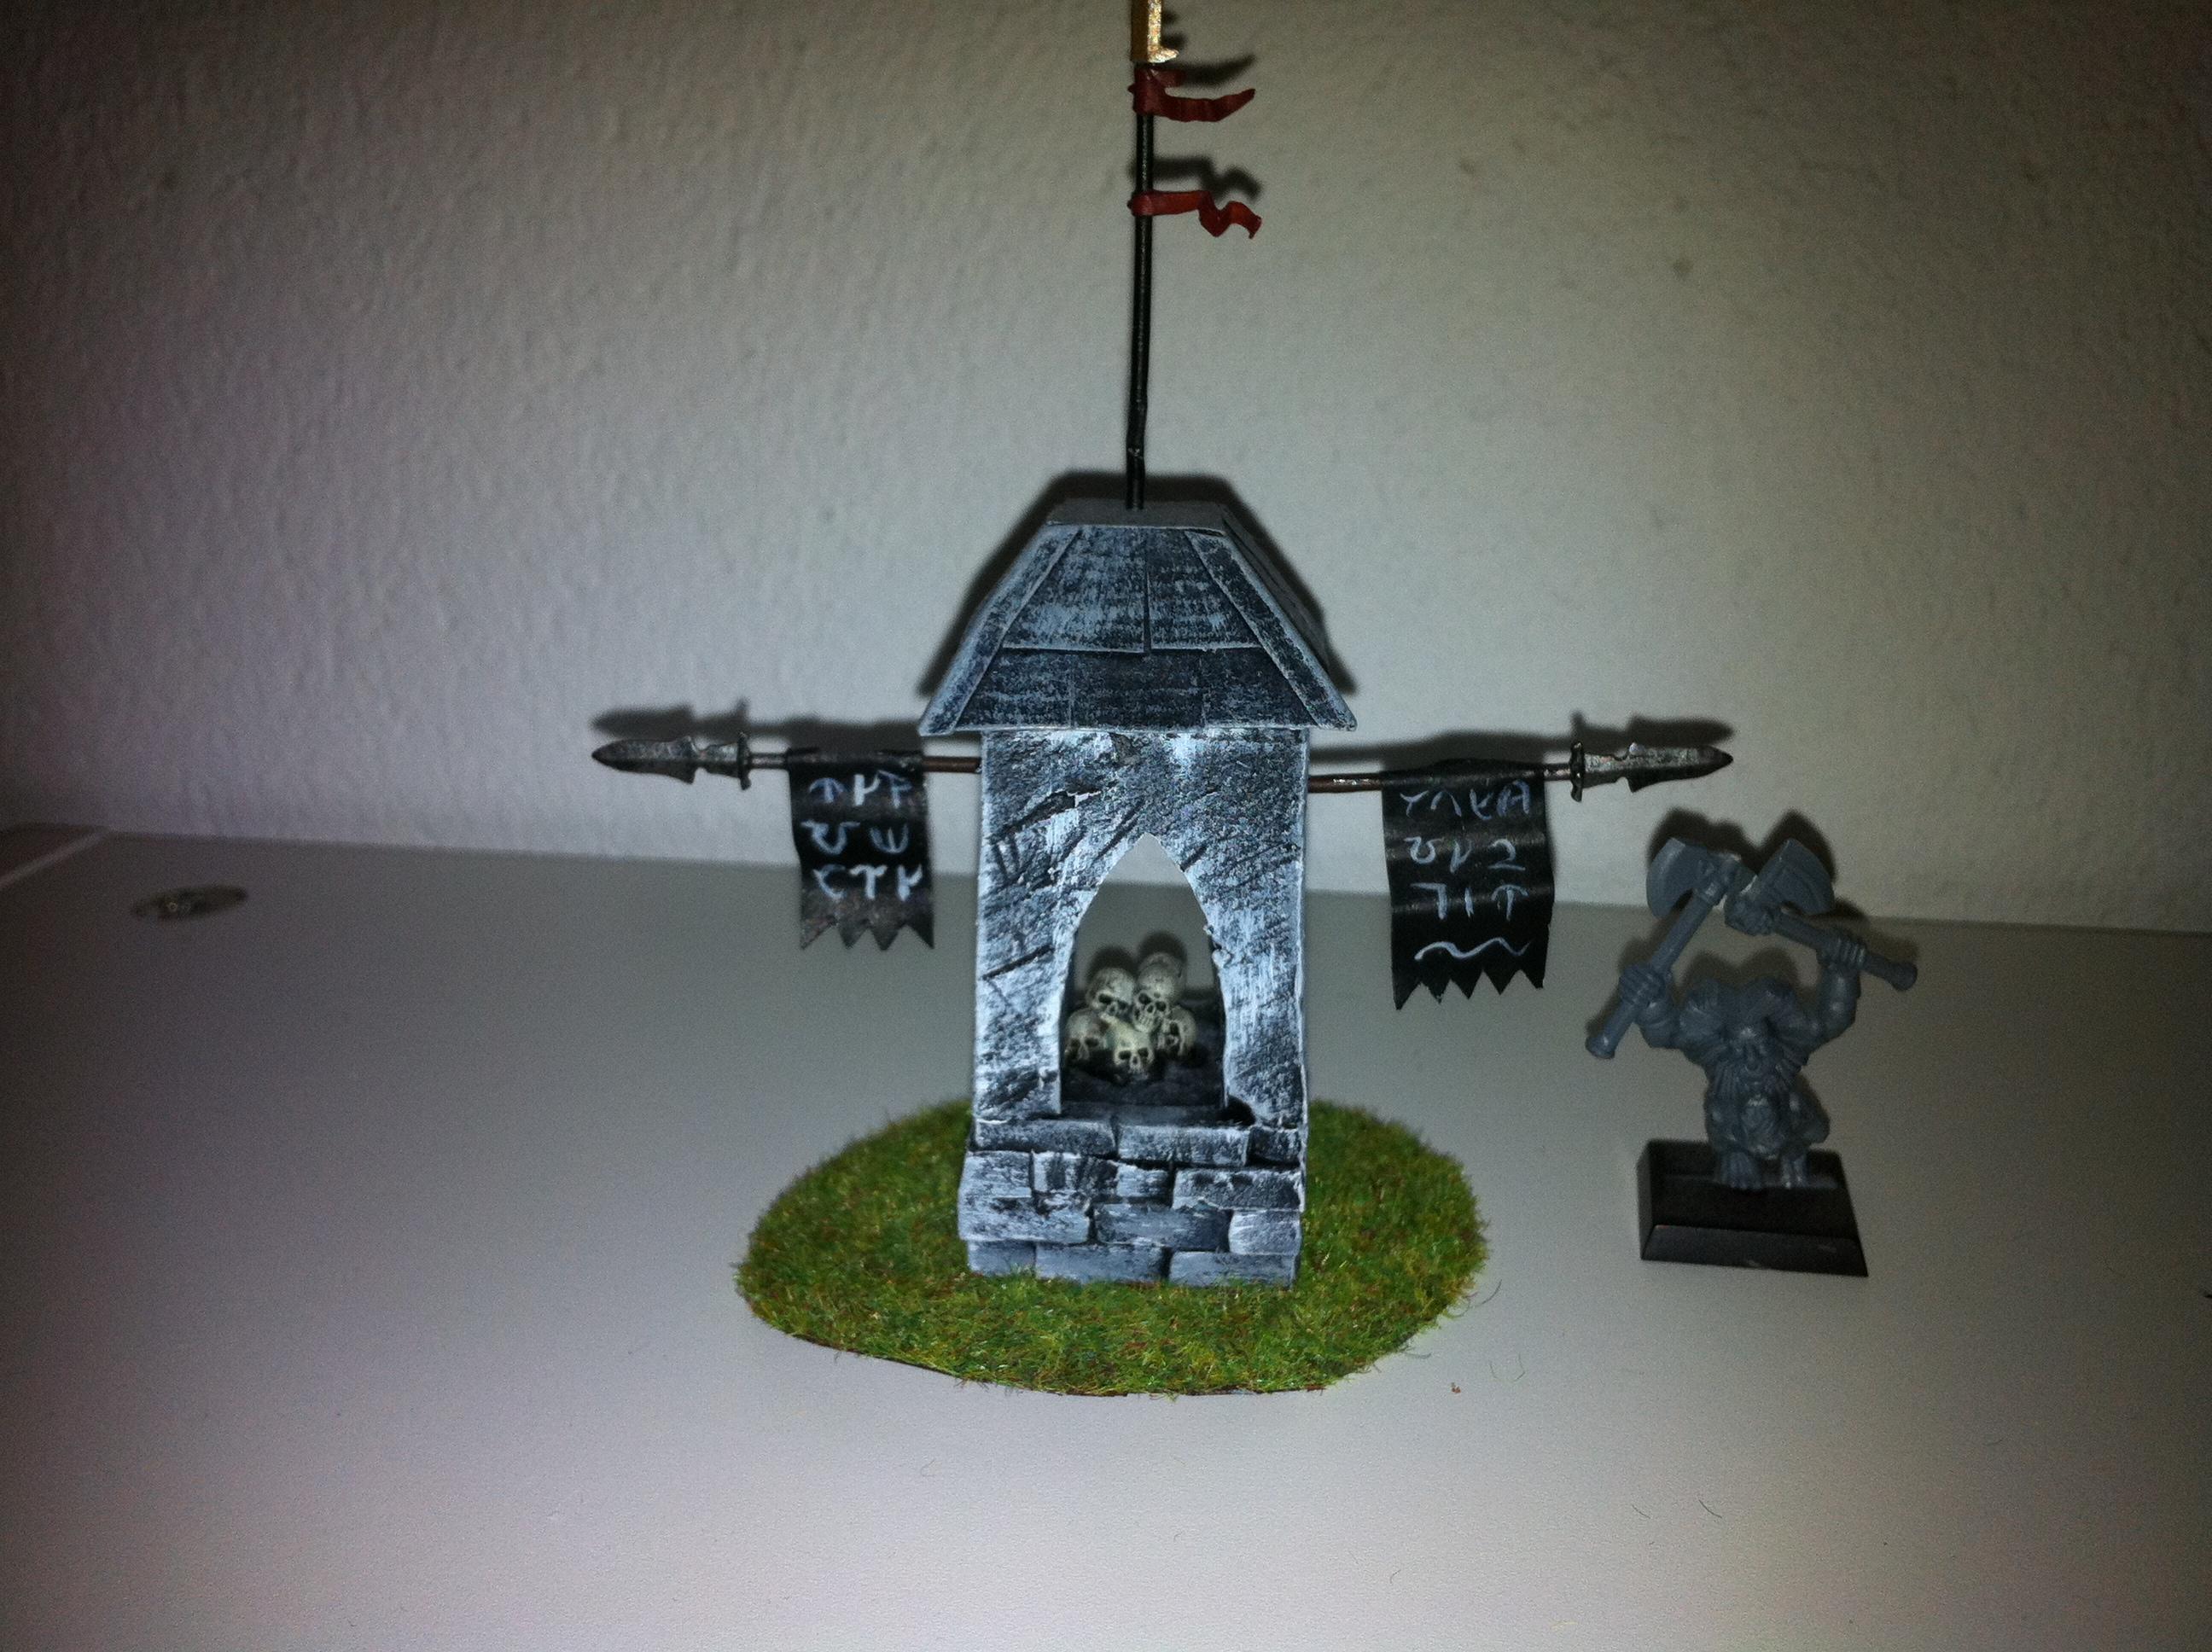 Terrain, Warhammer Fantasy